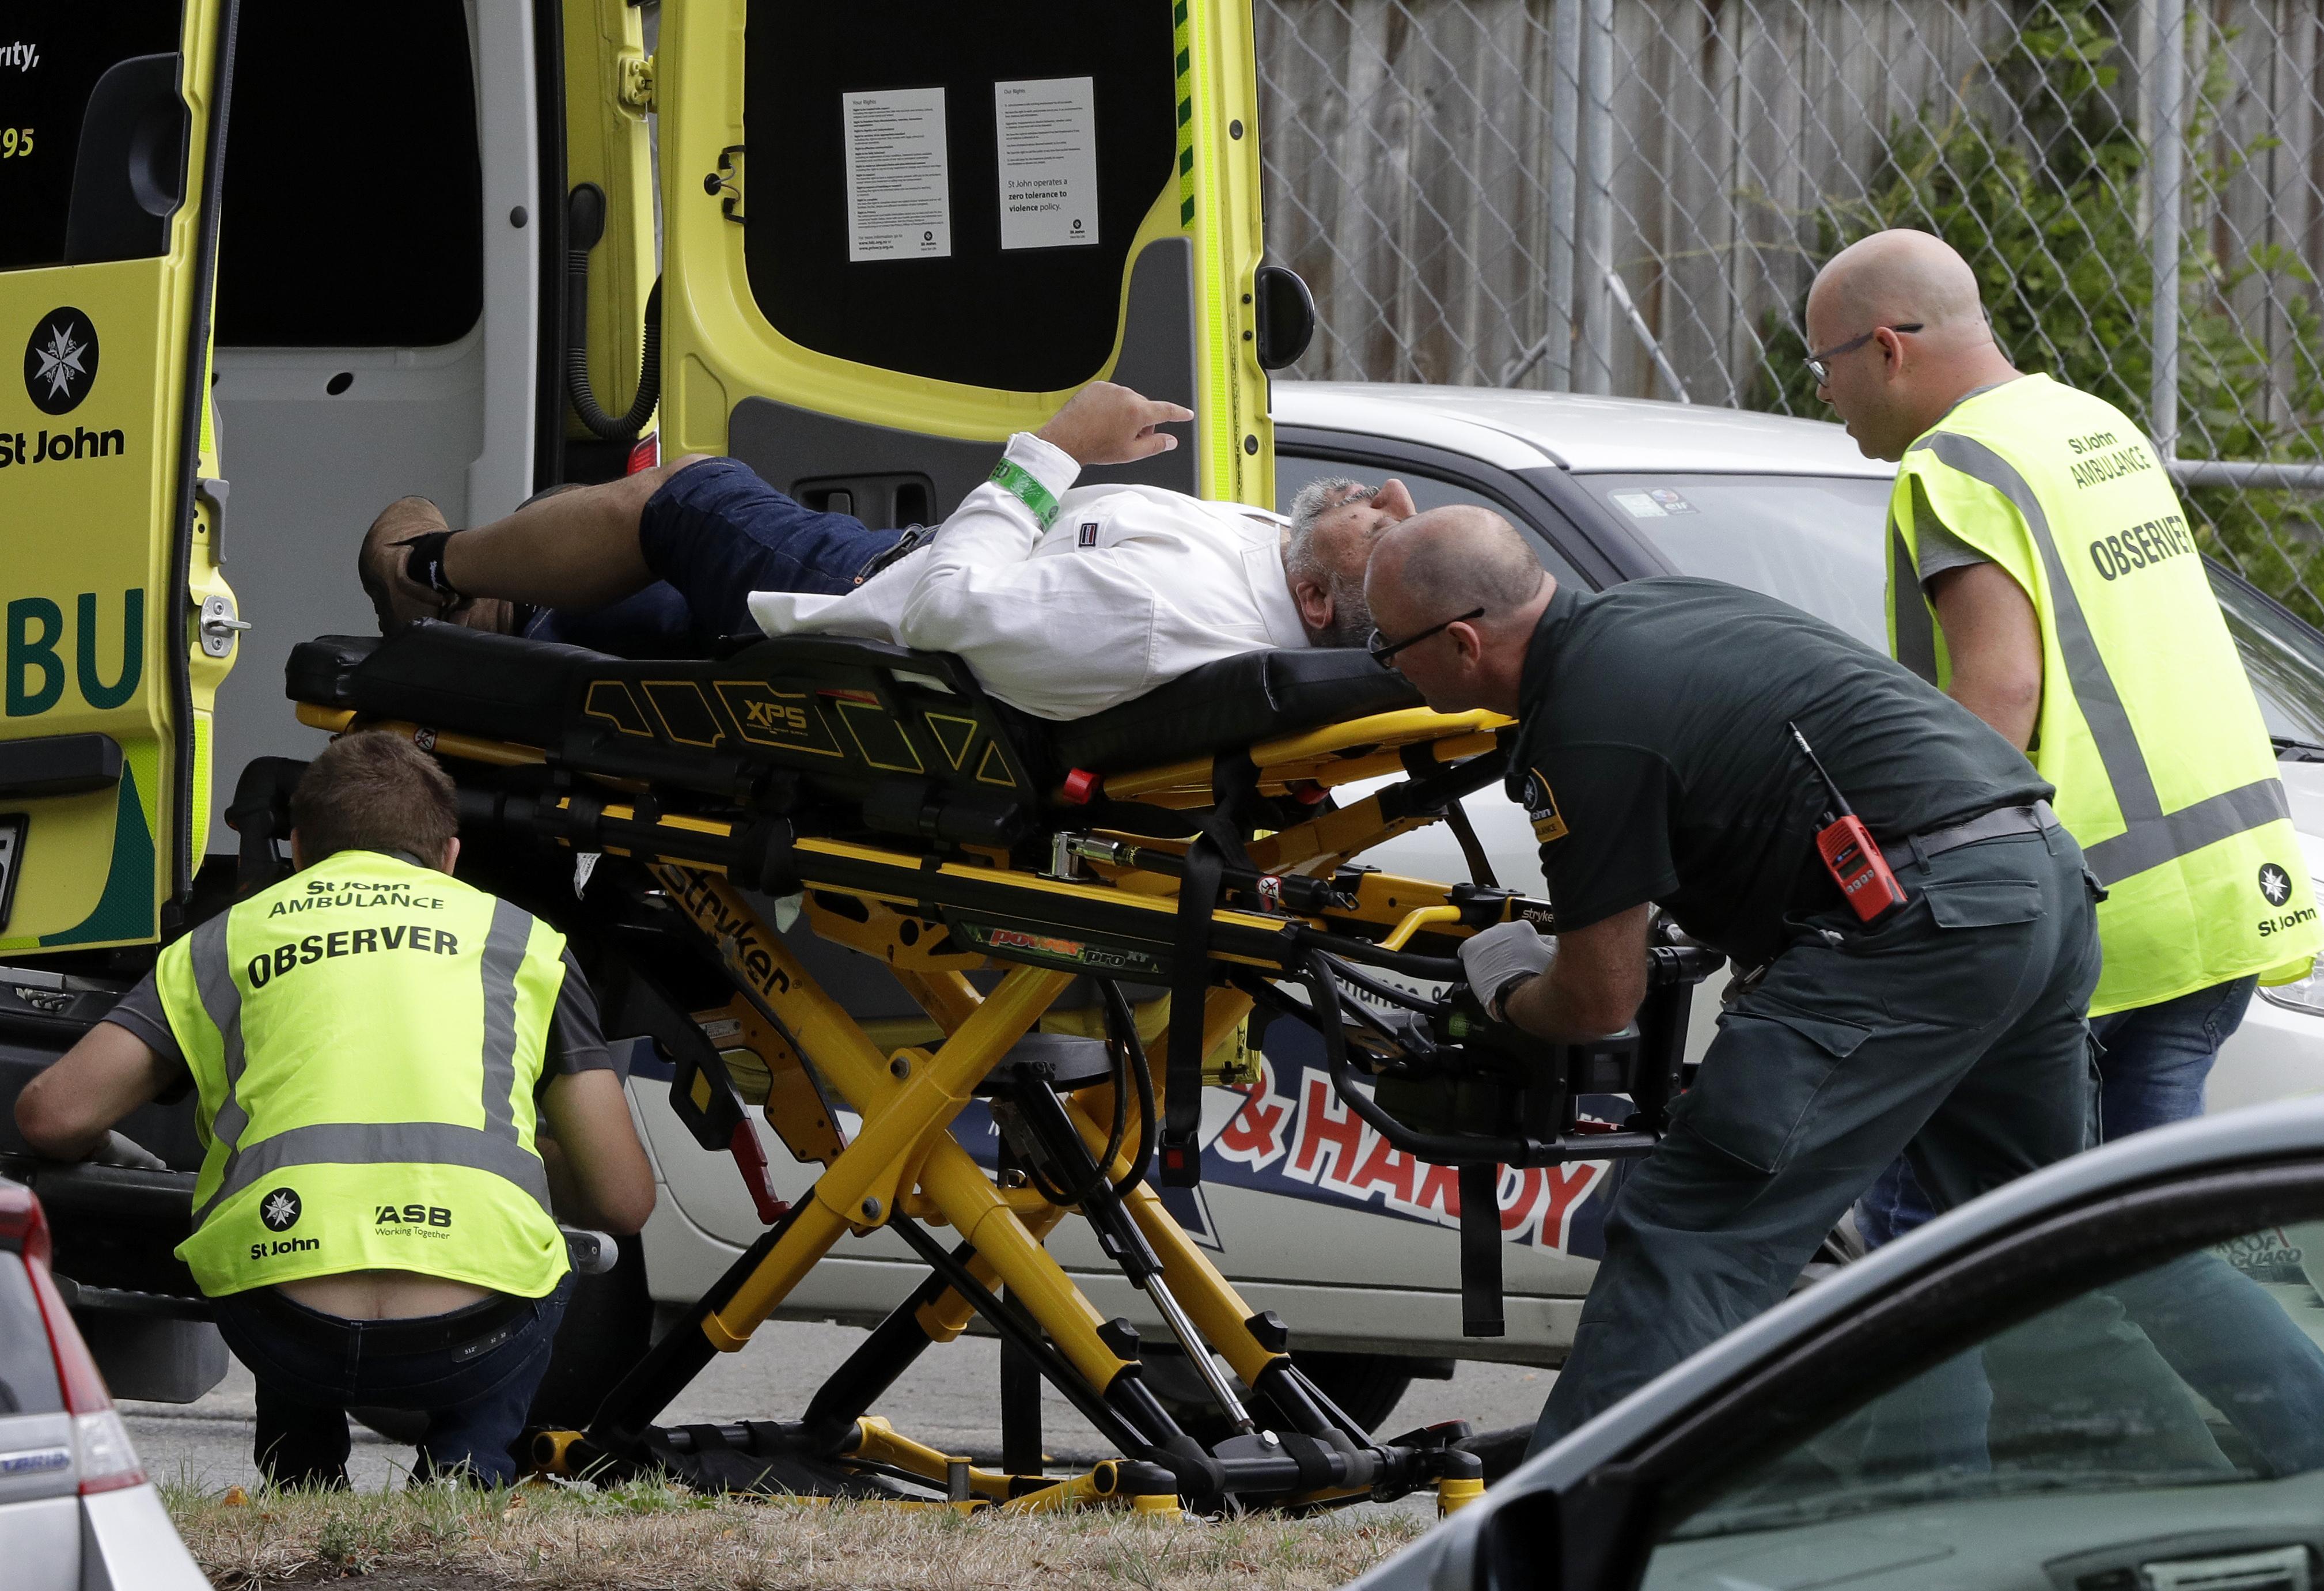 New Zealand Massacre Photo: Mosque Massacre In New Zealand Leaves 49 Dead; 1 Man